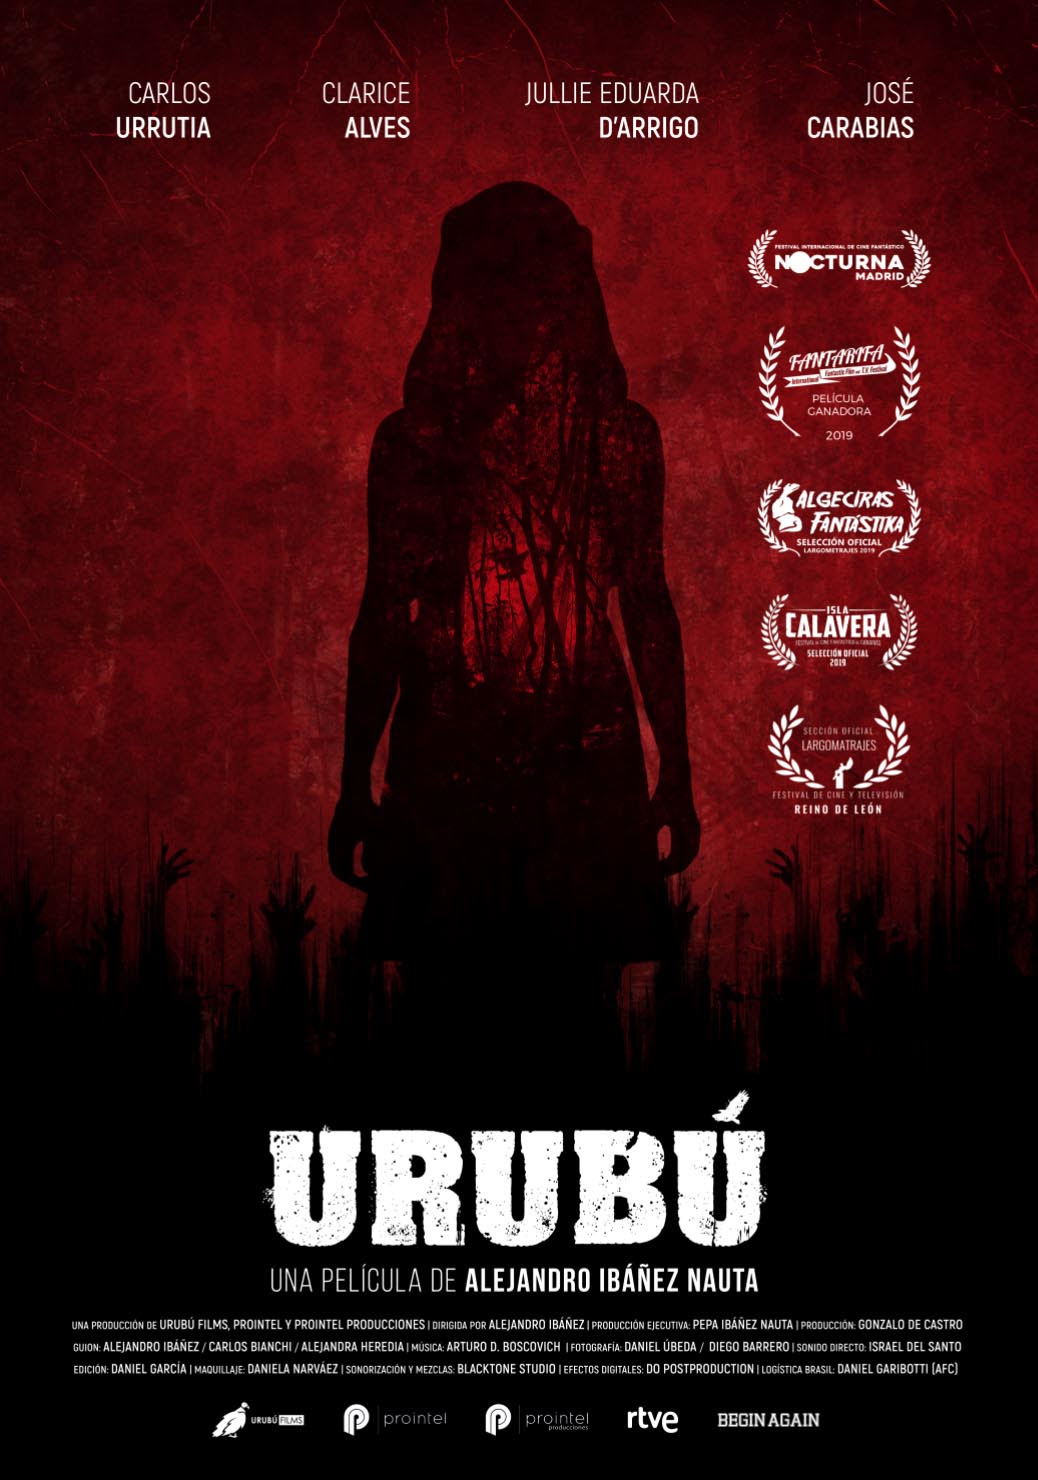 Cartel de Urubú